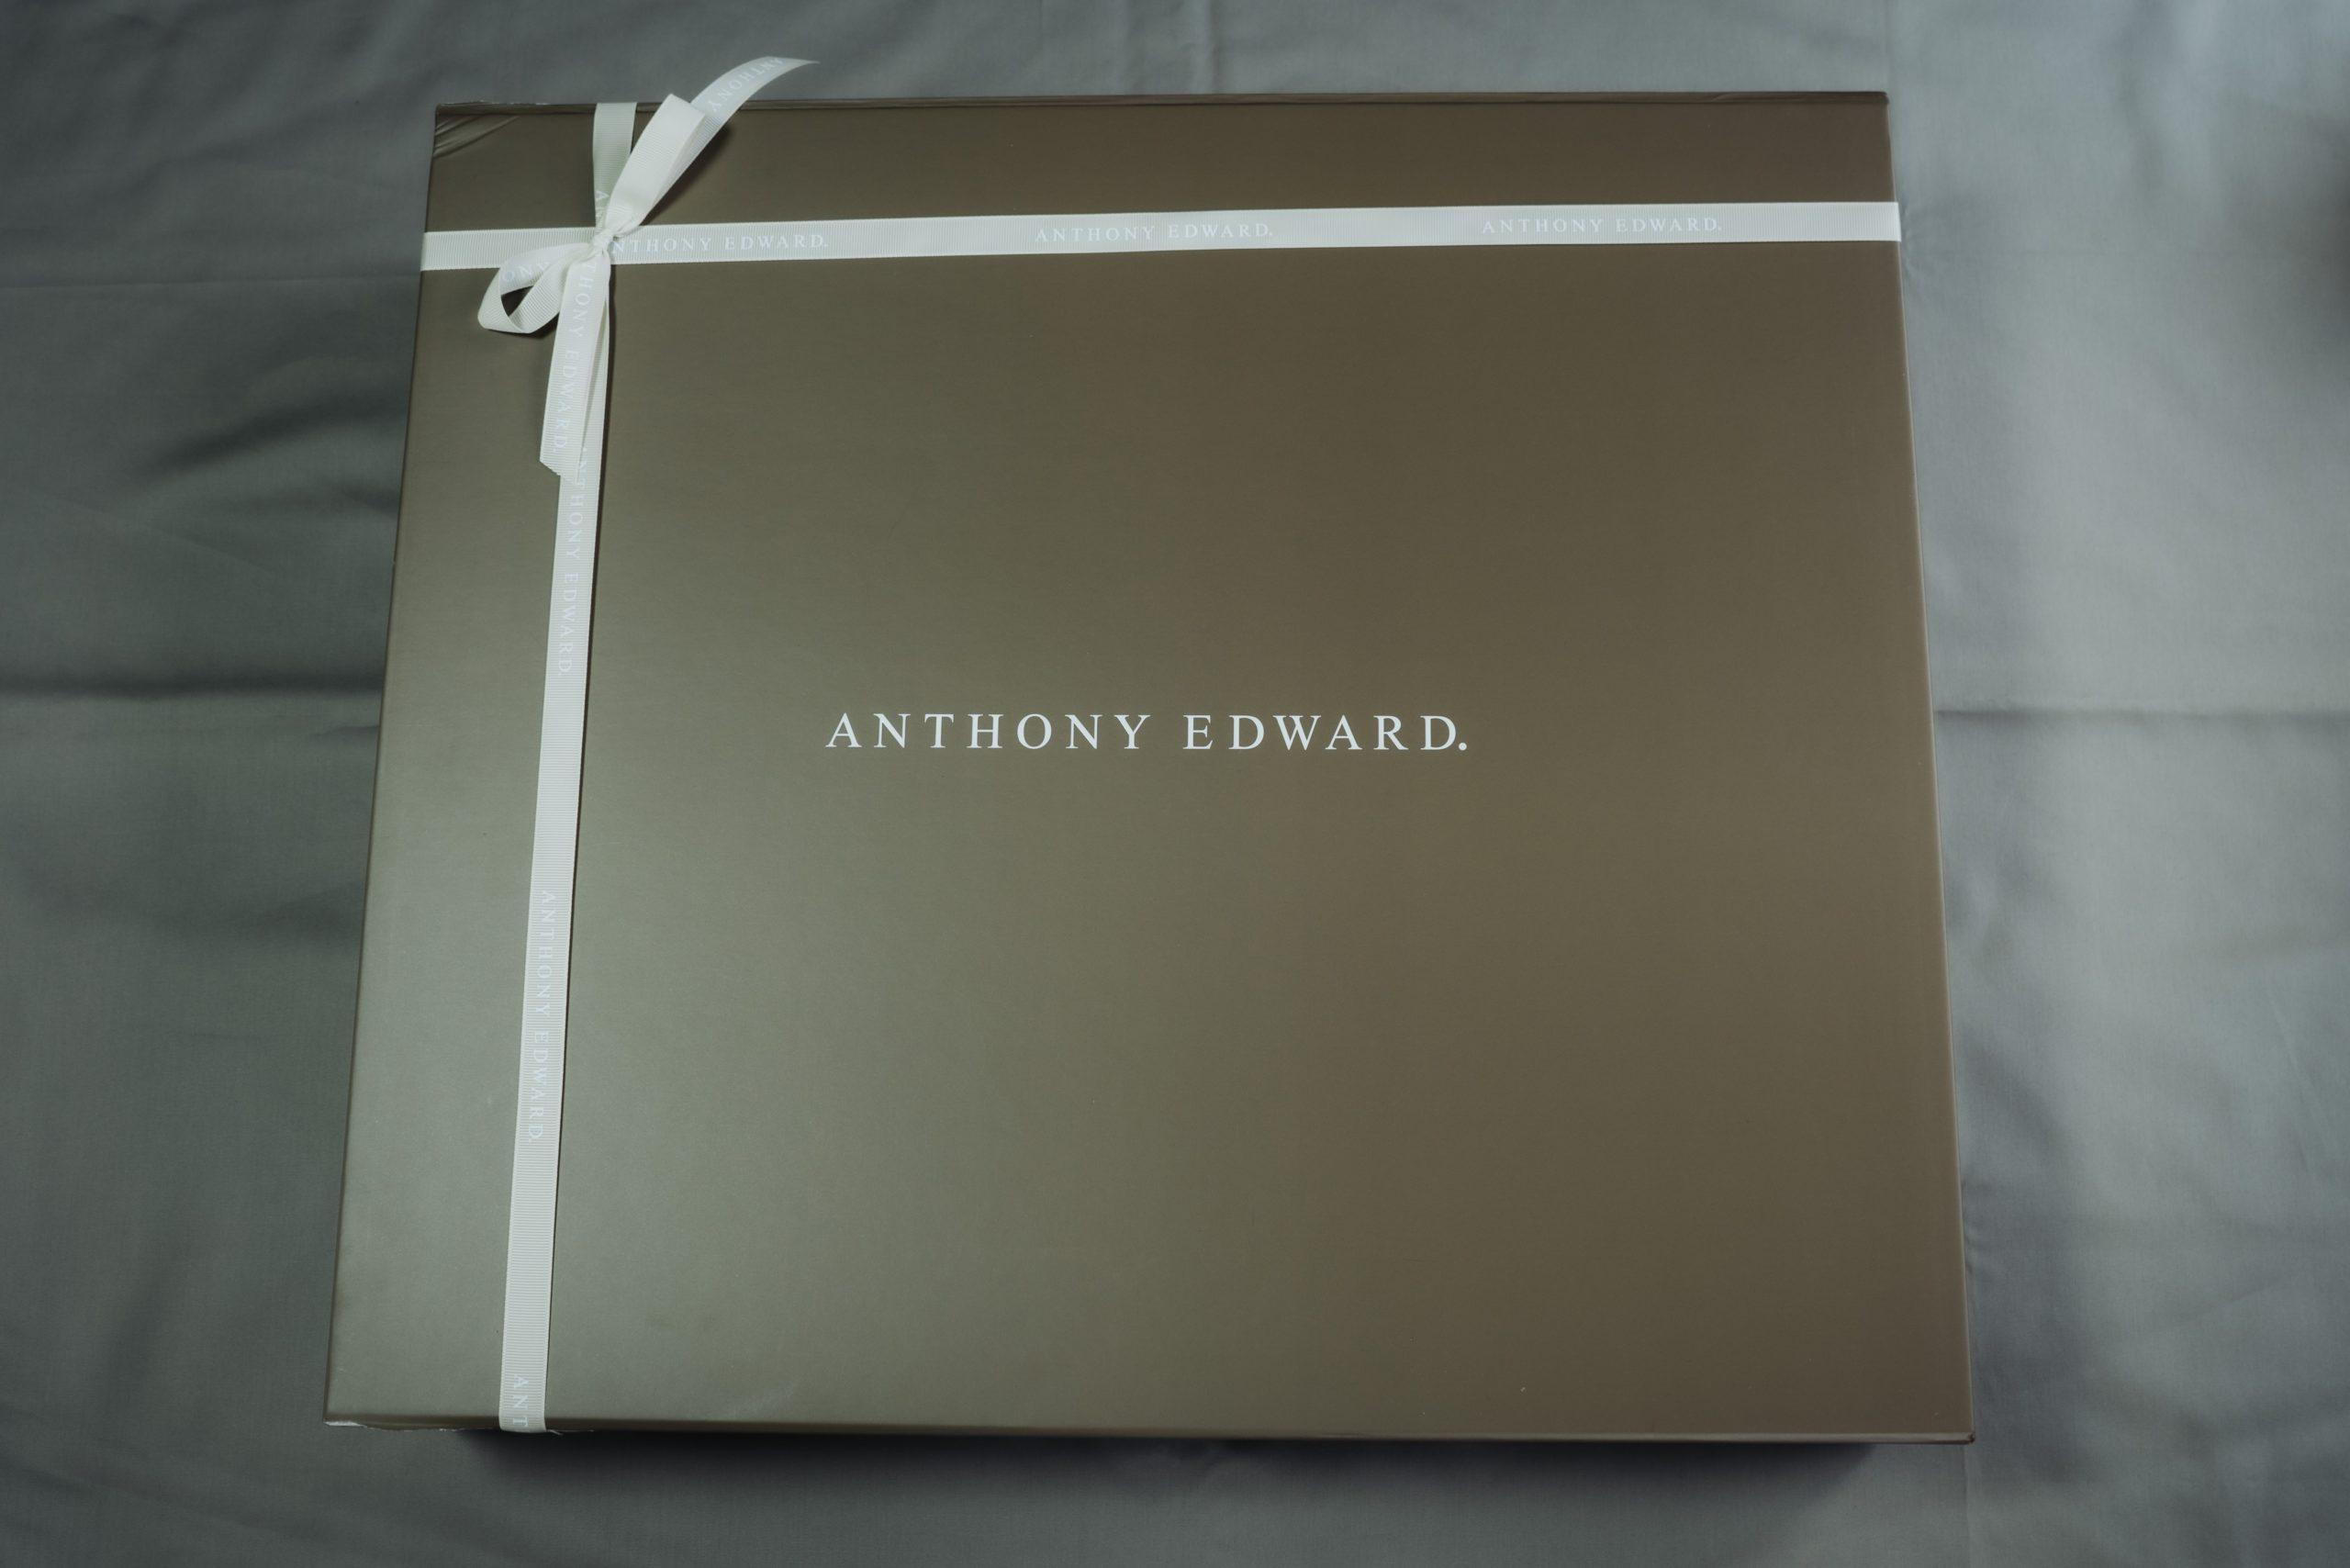 ANTHONY EDWARD ダッフルバッグの梱包